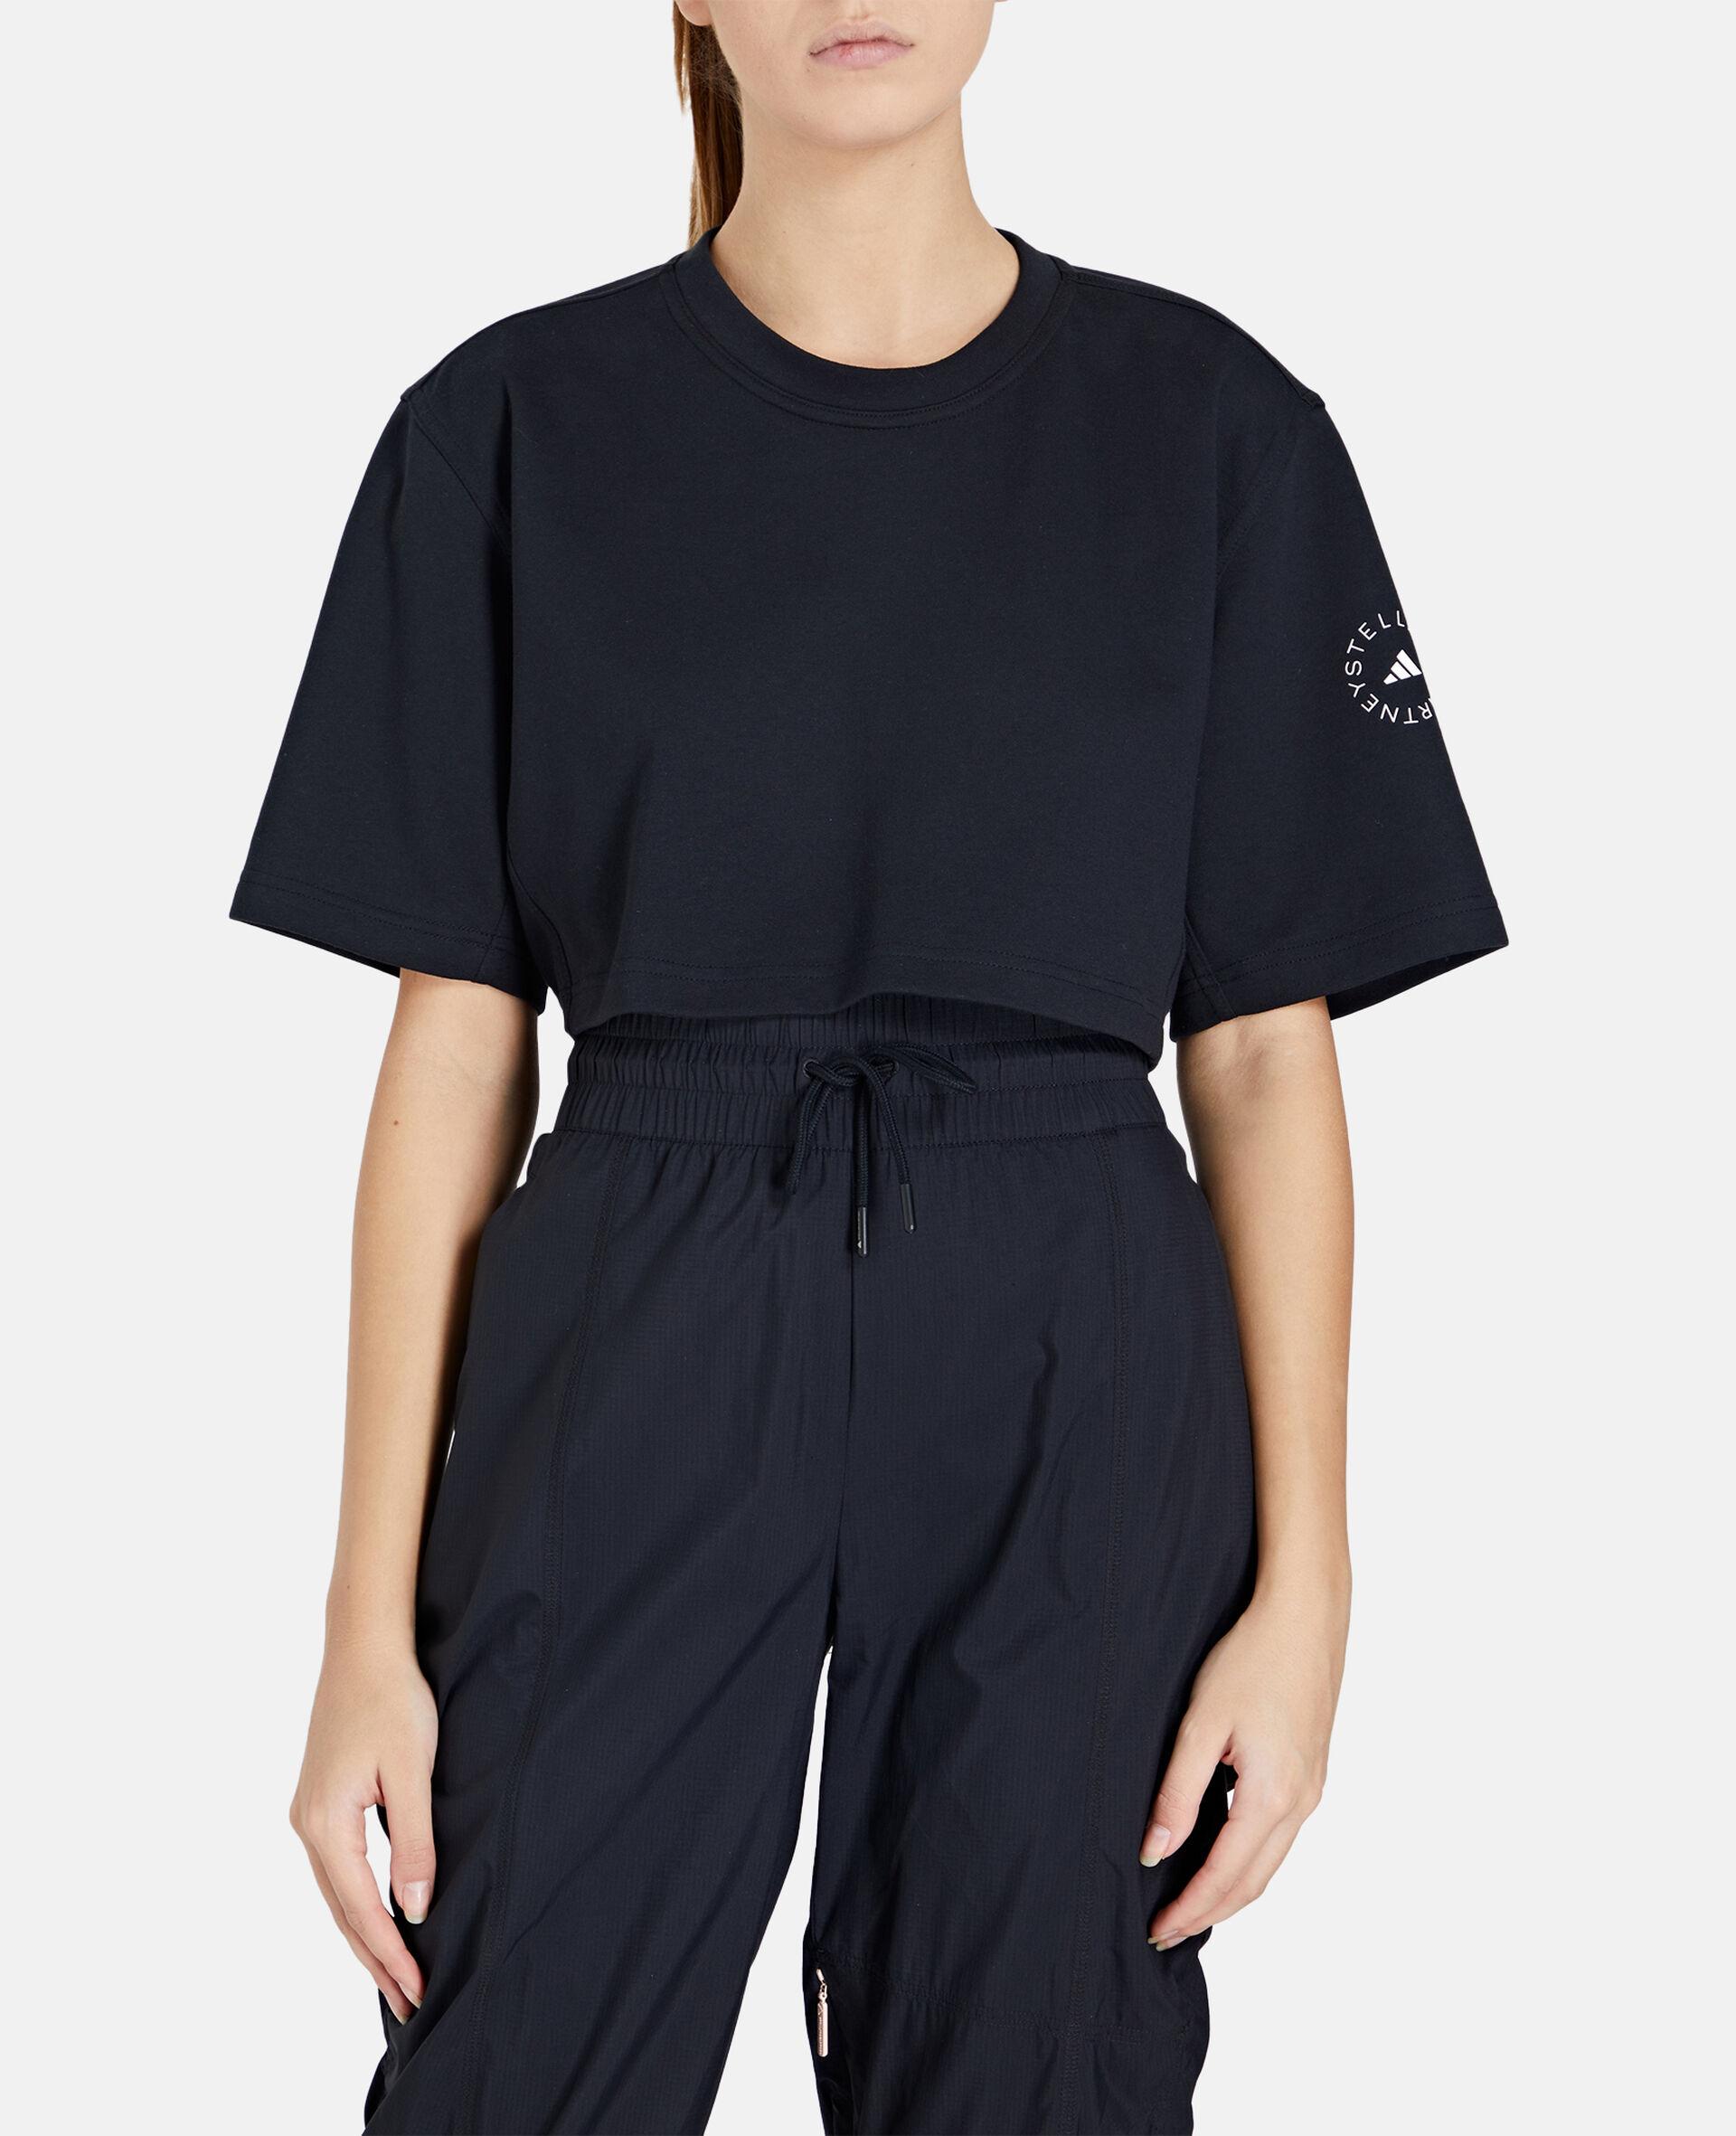 Future Playground Crop T-Shirt-Black-large image number 4